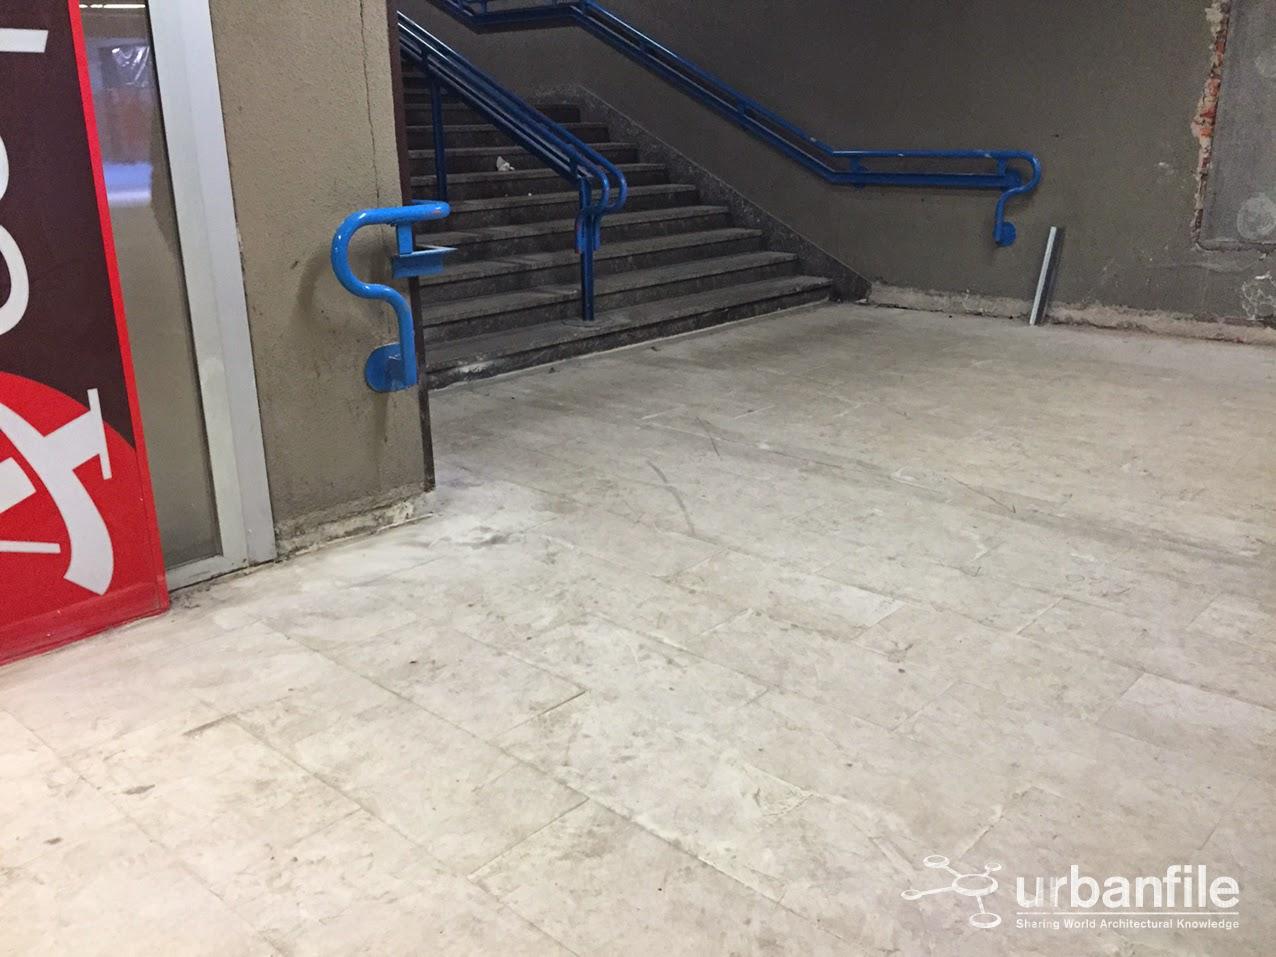 Urbanfile milano zona porta garibaldi i lavori alla - Milano porta garibaldi passante mappa ...